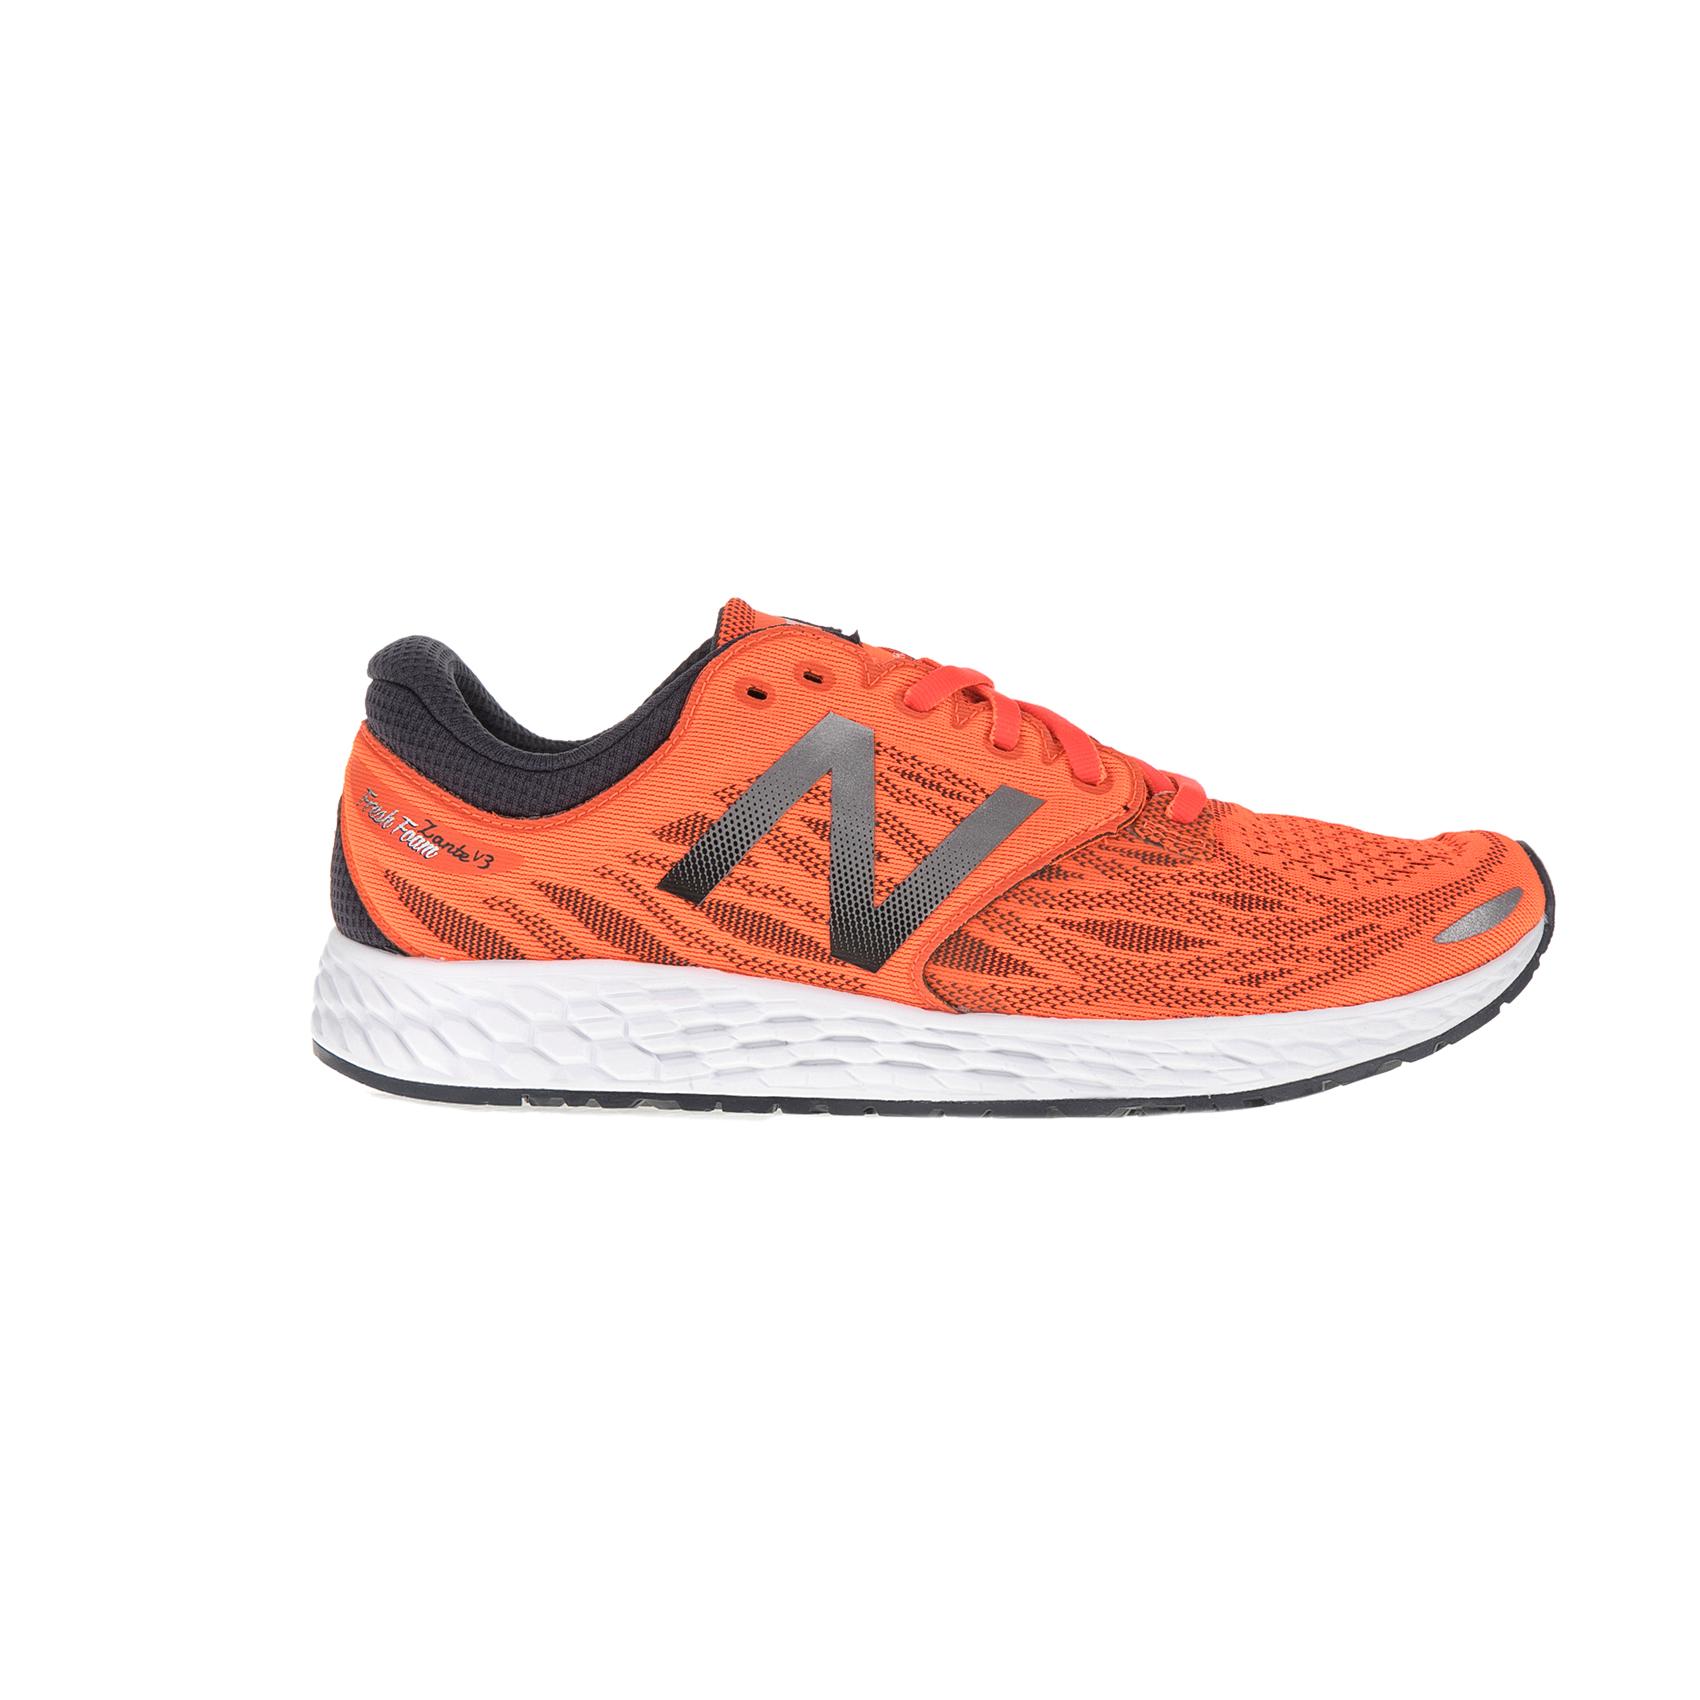 NEW BALANCE – Ανδρικά παπούτσια NEW BALANCE MZANTOB3 πορτοκαλί